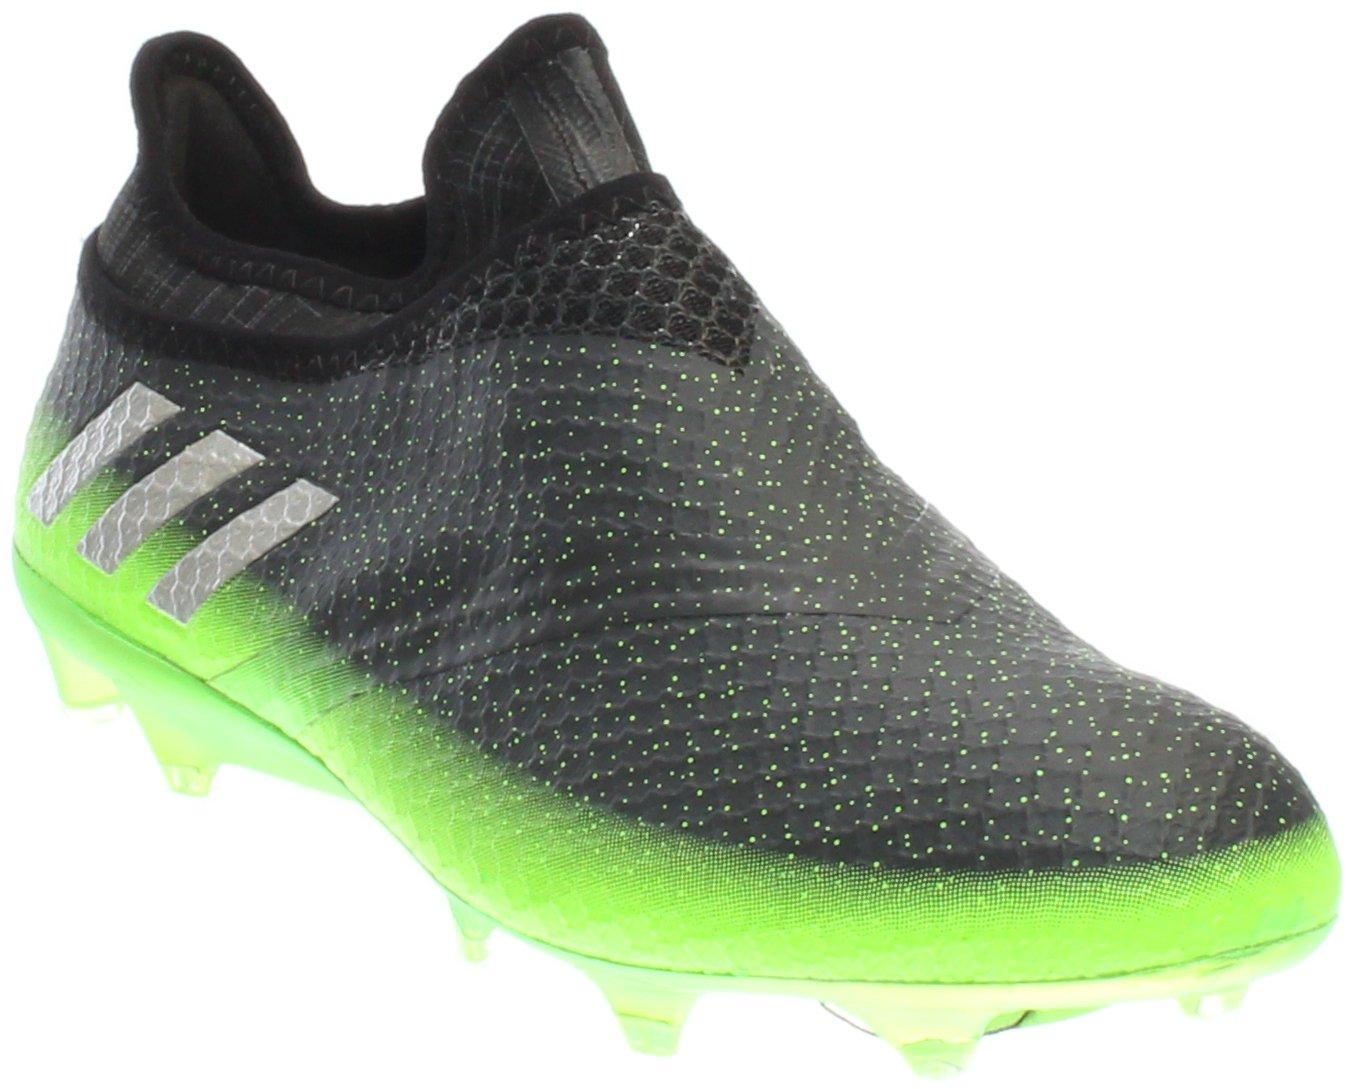 adidas Mens Messi 16+ Pureagility FG Soccer Sprint Frame Cleats B01MA277JZ 7.5 D(M) US|Dark Grey/Silver Metallic/Solar Green